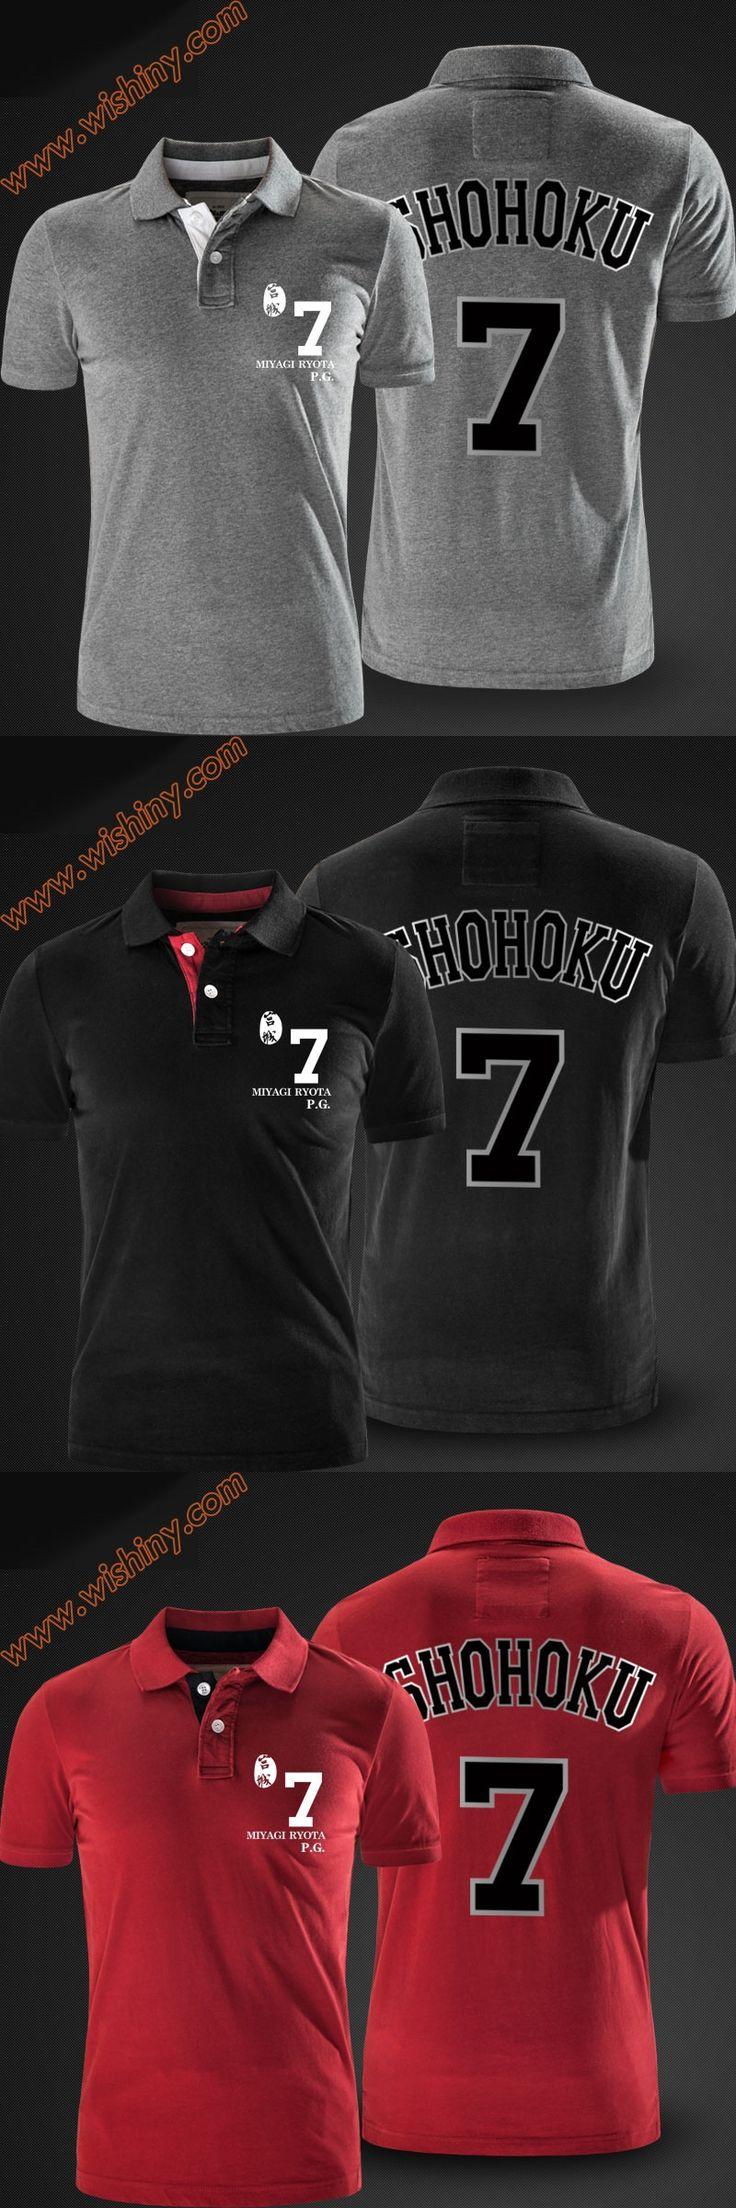 Slam Dunk Miyagi Ryota Polo Shirts Men Short Sleeve Tops Summer Black Red Grey Shohoku Polos